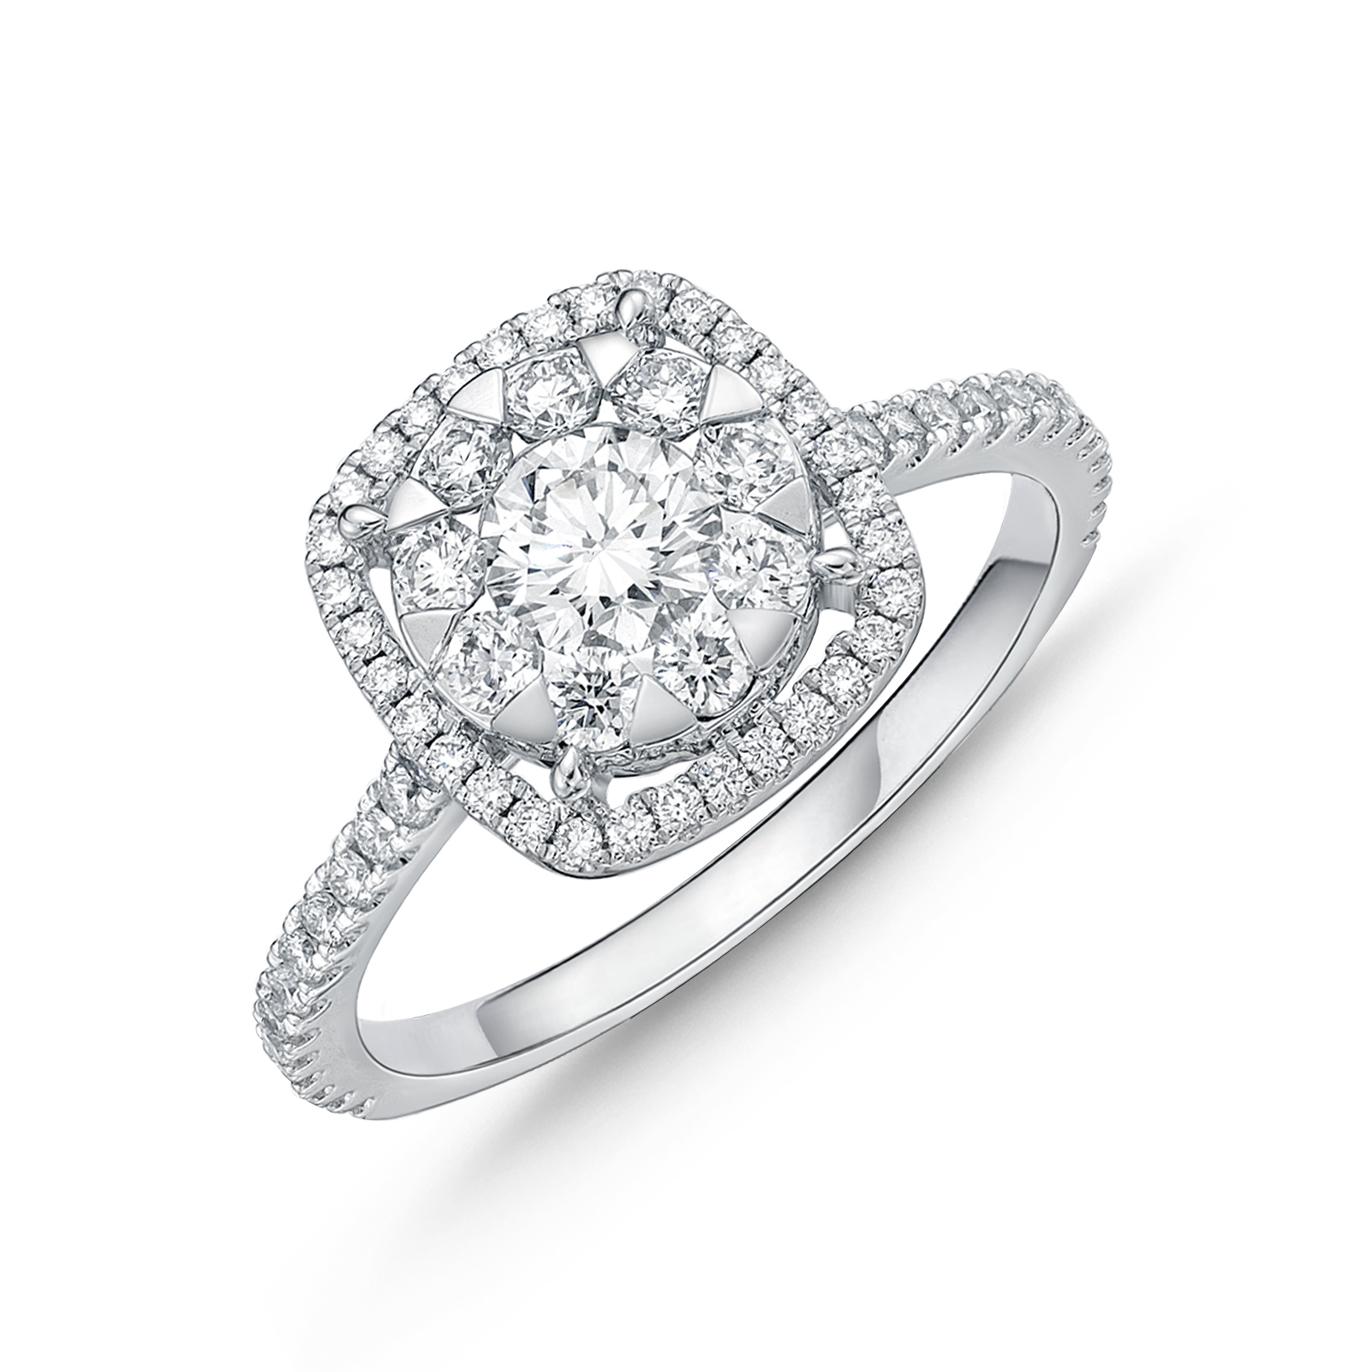 Memoire 18ct White Gold 3/4 Carat Diamond Bouquet Cushion Halo Solitaire Ring